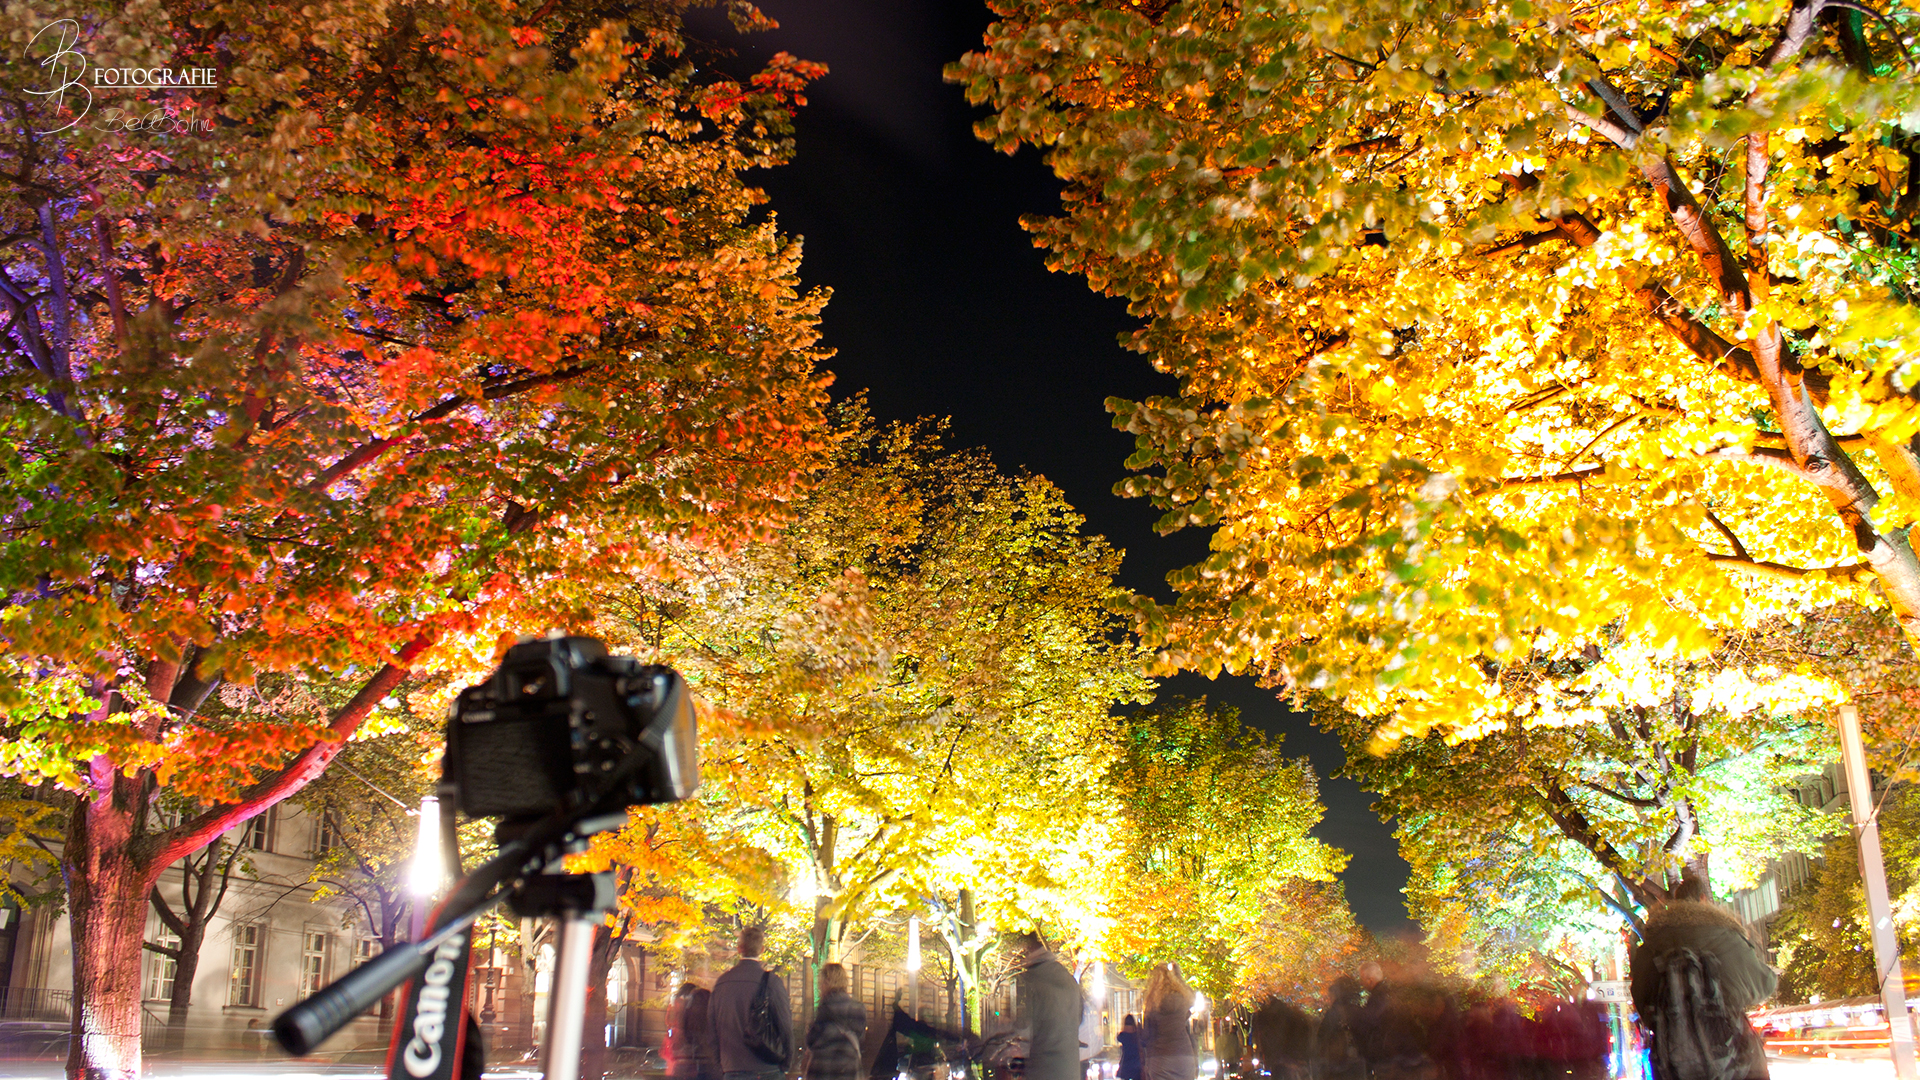 18 Berlin Unter den Linden zum Festival of Lights